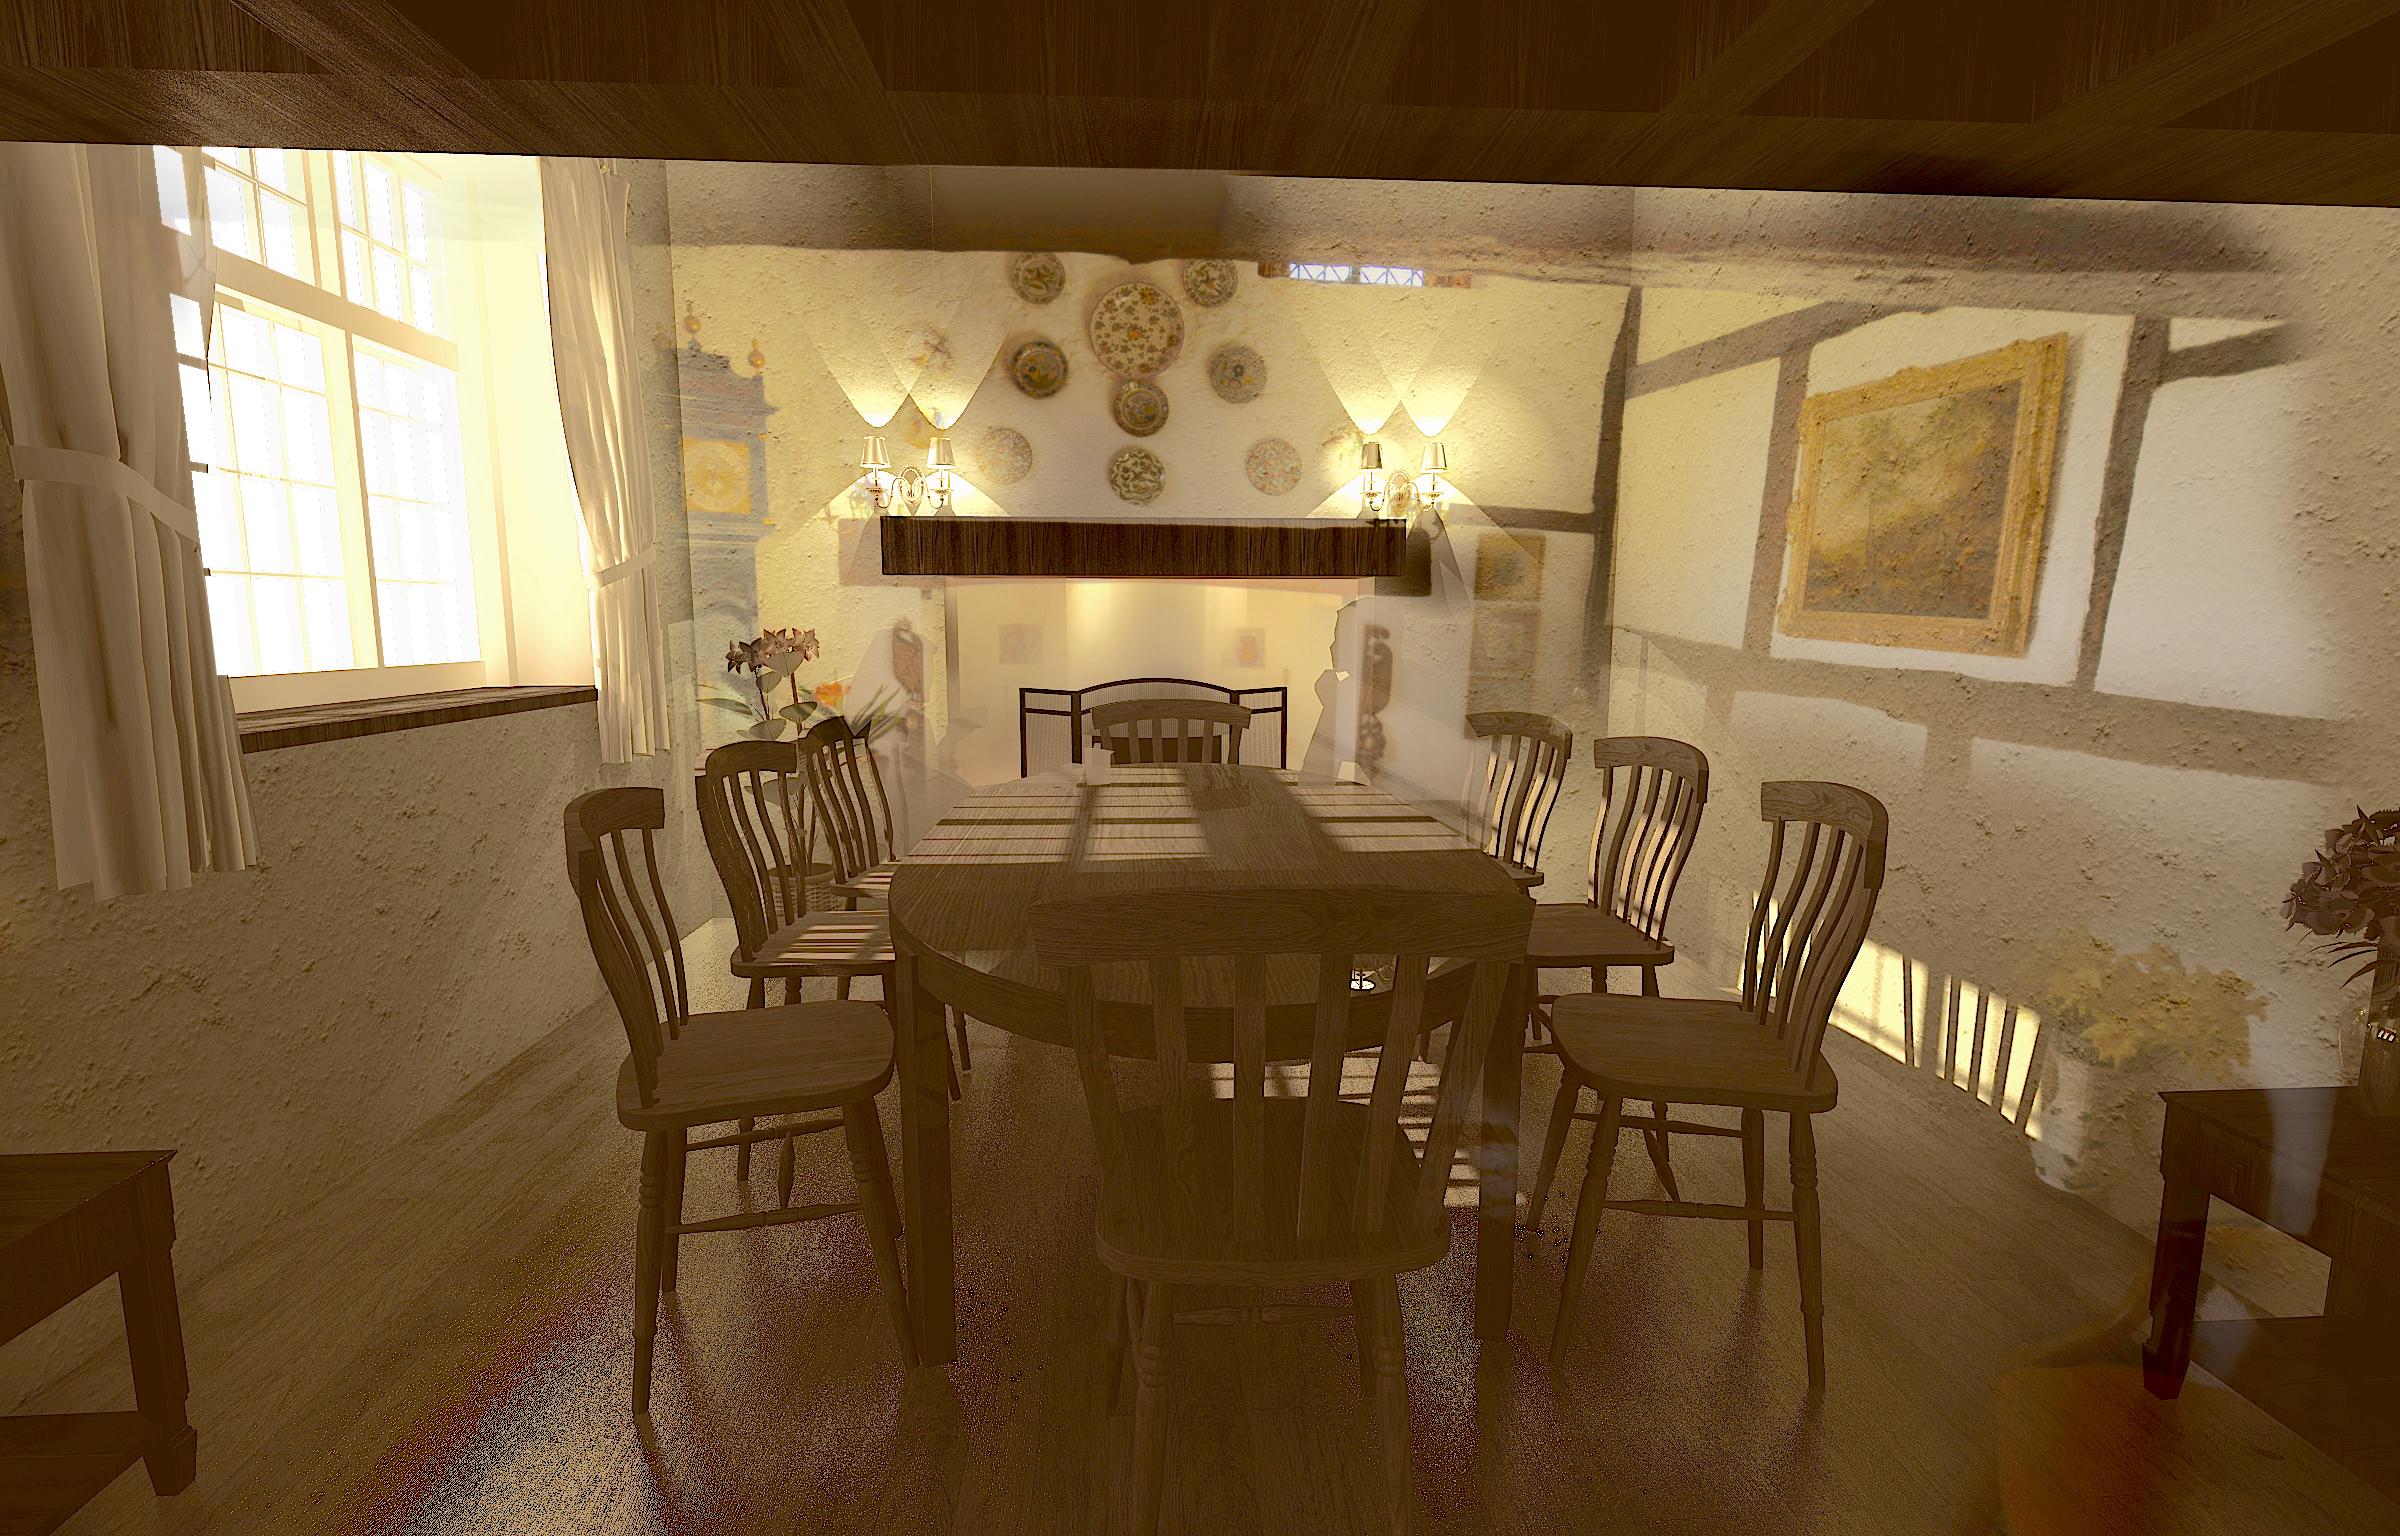 Interior Design for Main Dining Room (Option 2)